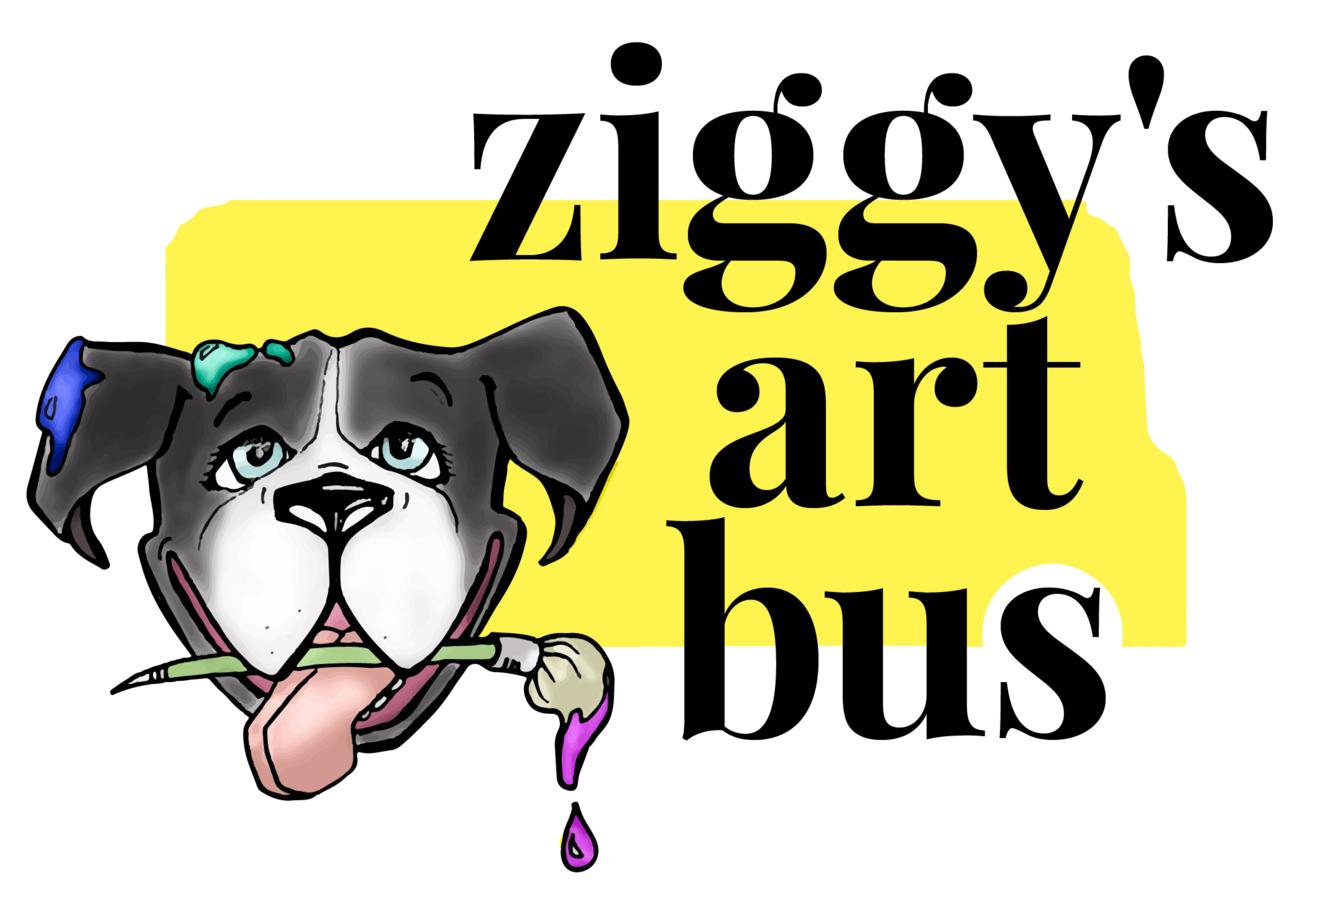 ziggys-art-bus-NO_tagline_white2.png